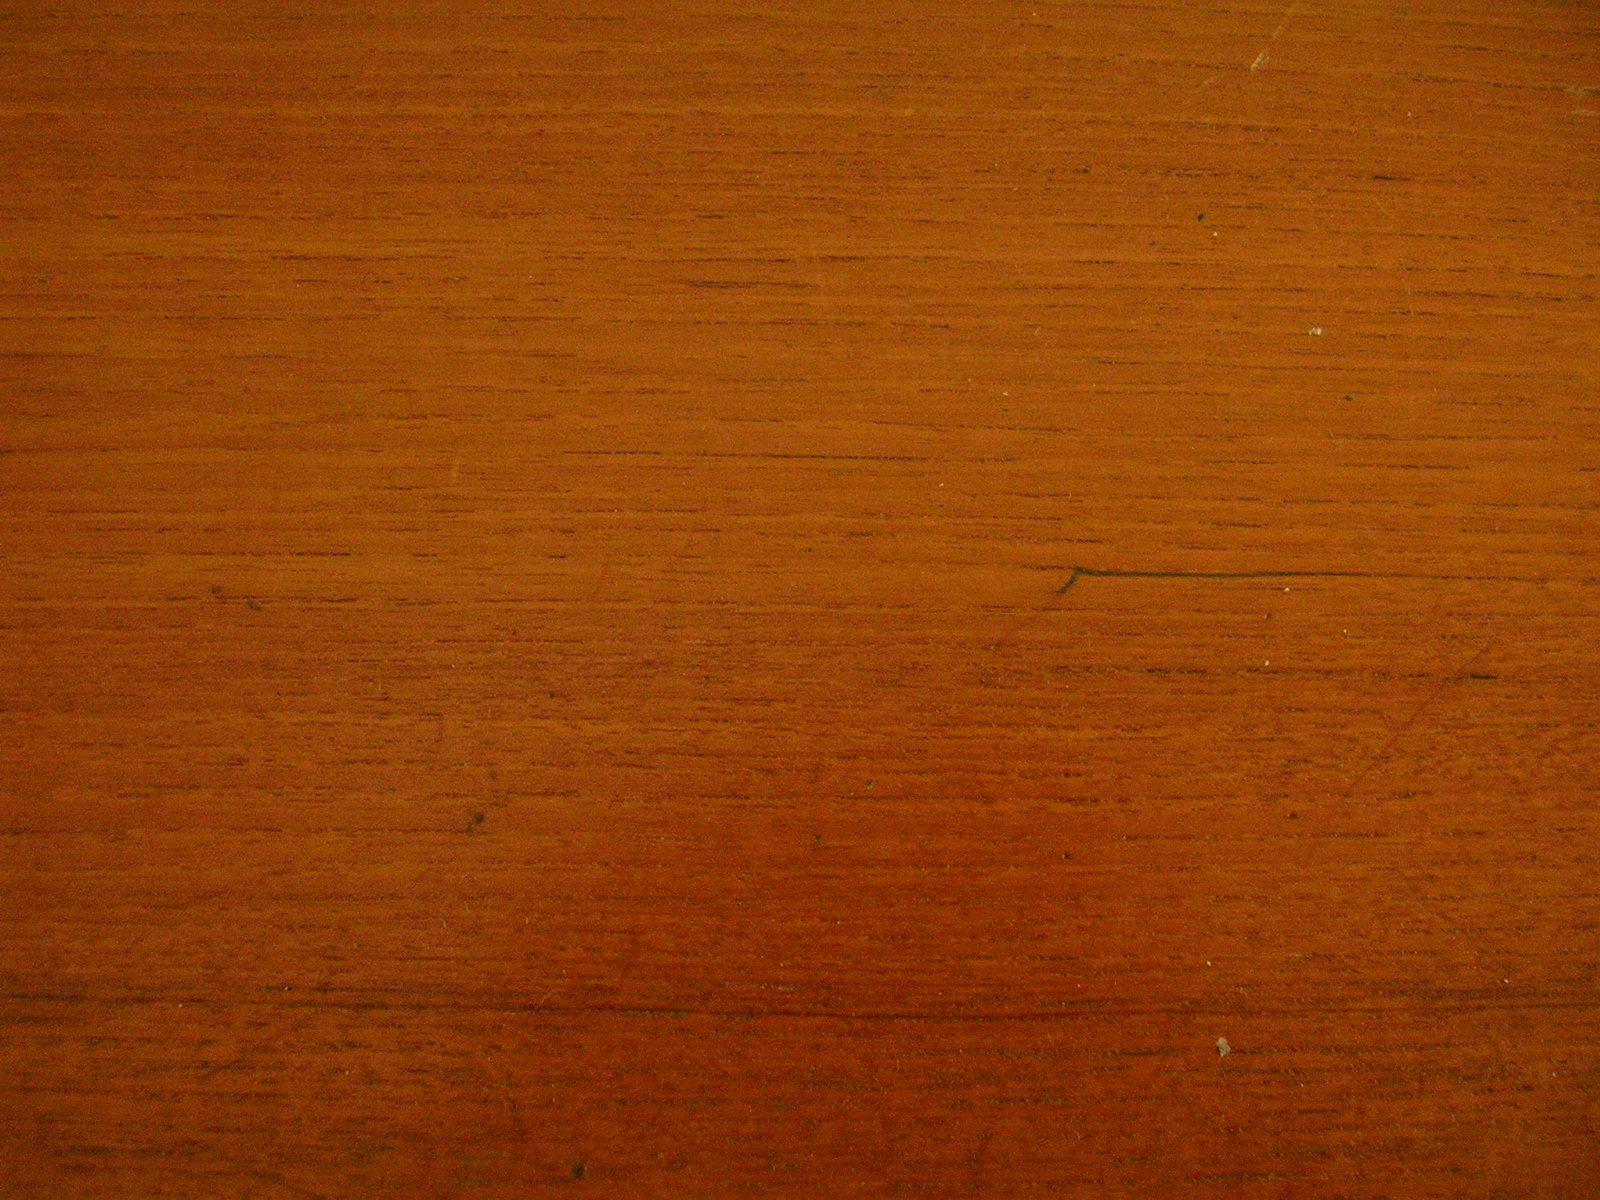 wood desk top view - photo #26